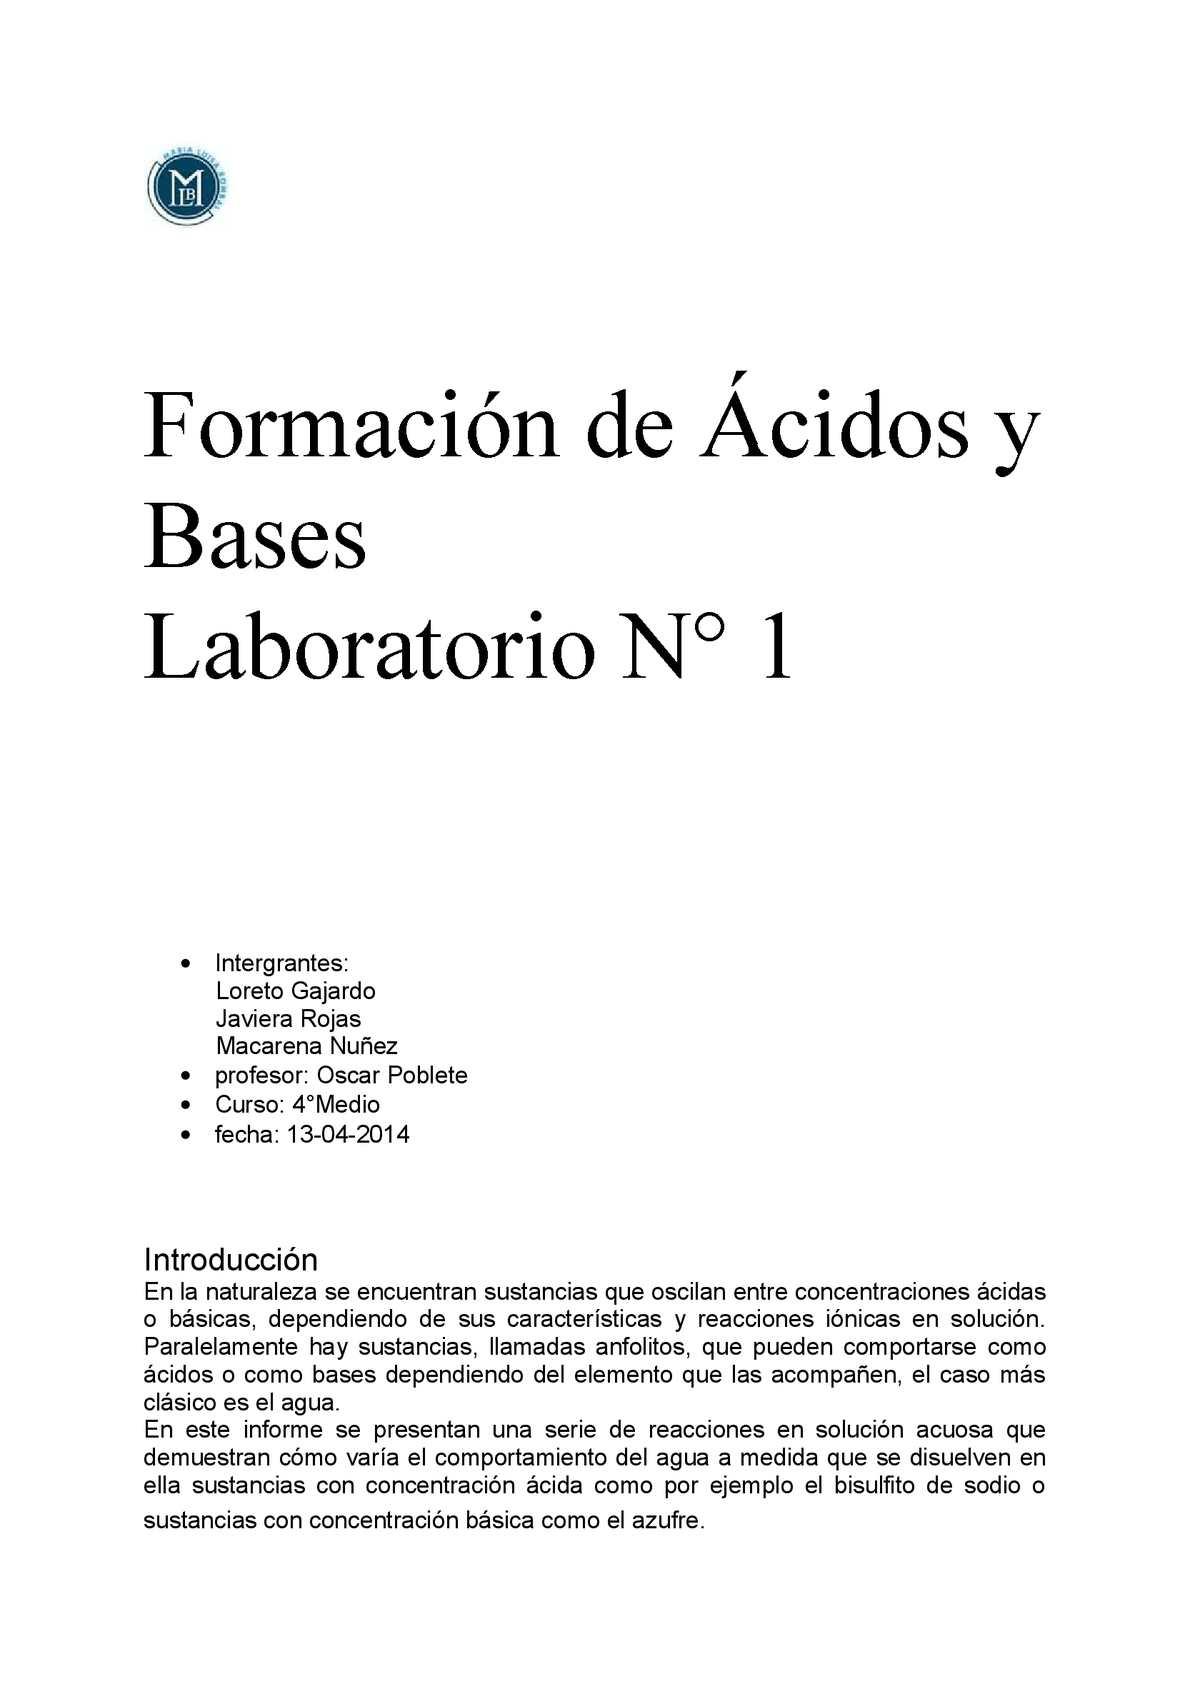 acidos y bases pdf bachillerato